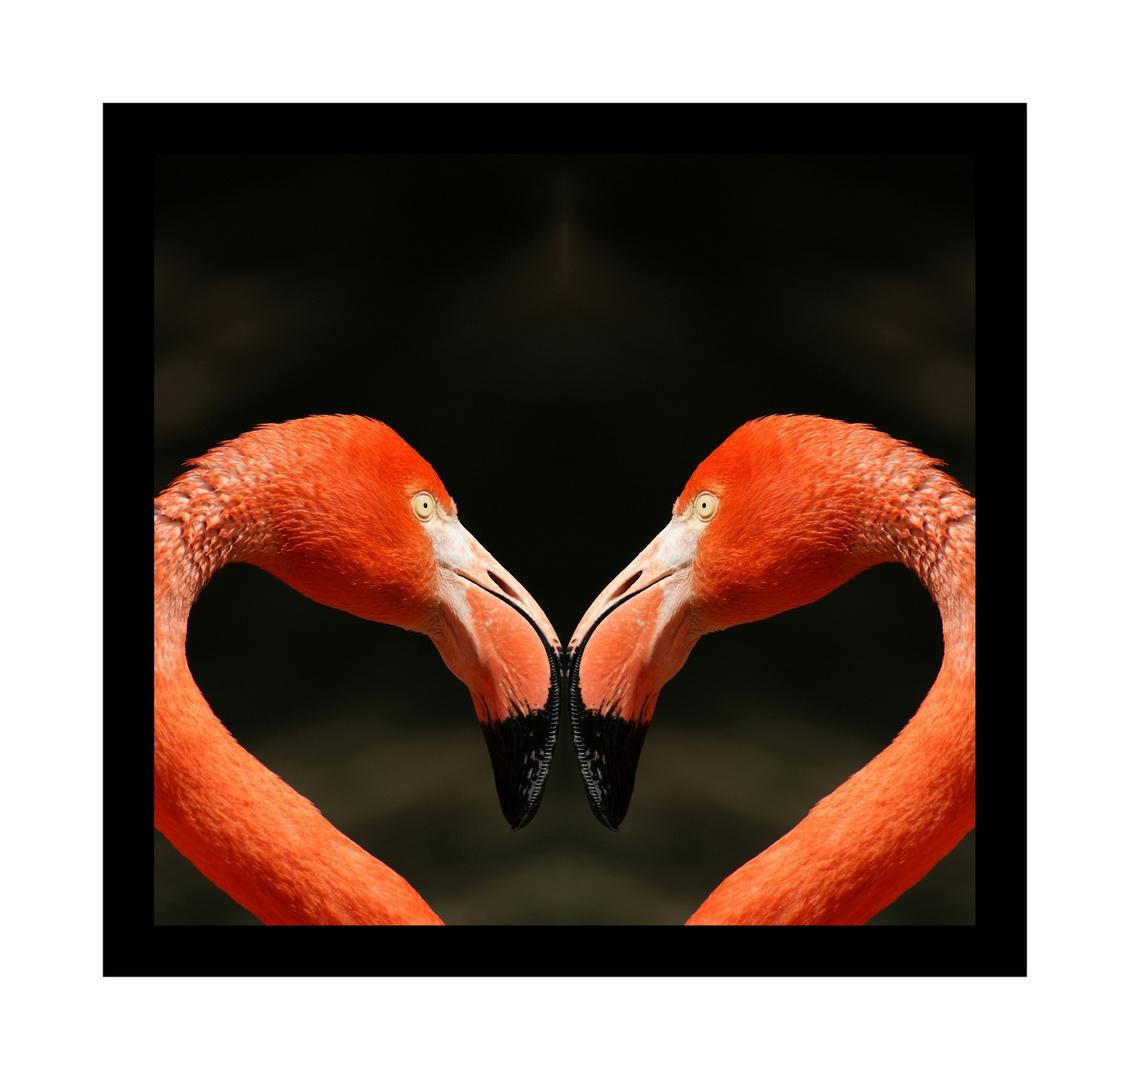 Flamingoherz